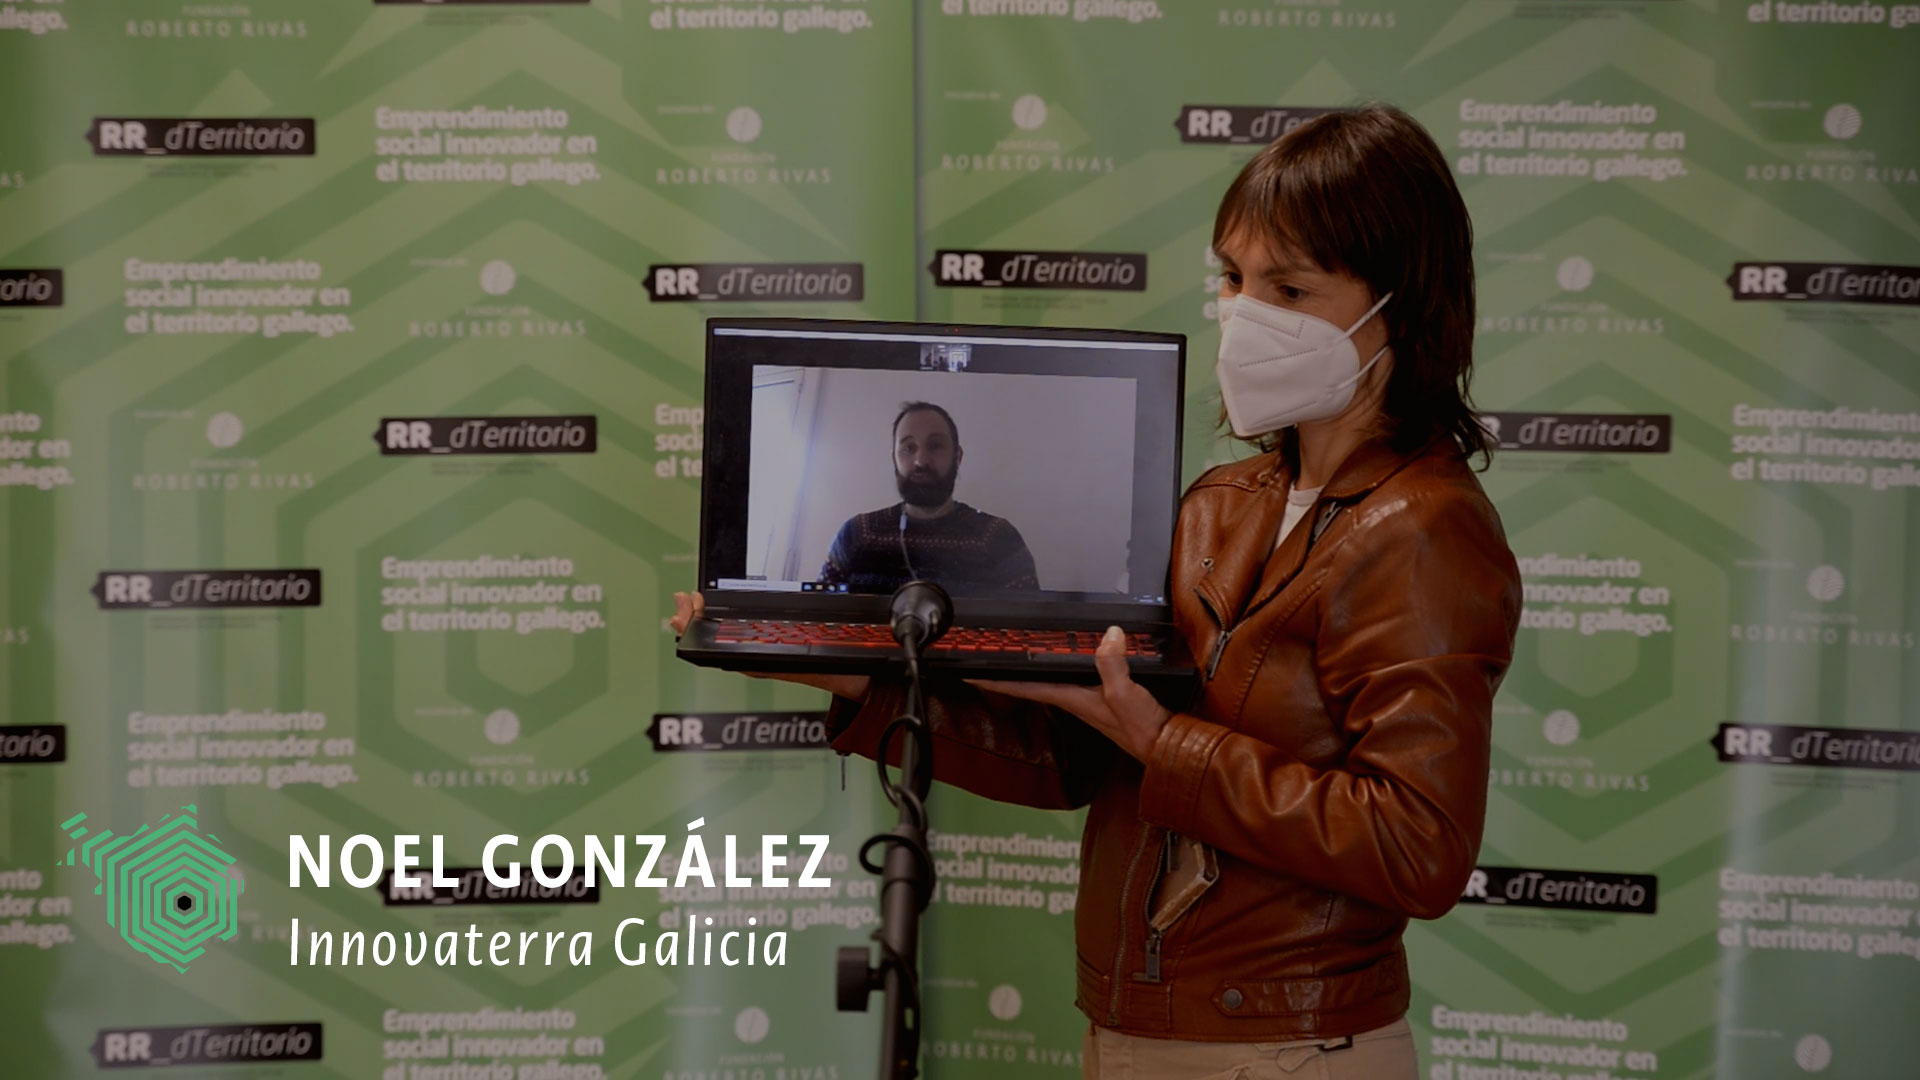 Innovaterra Galicia de Noel González